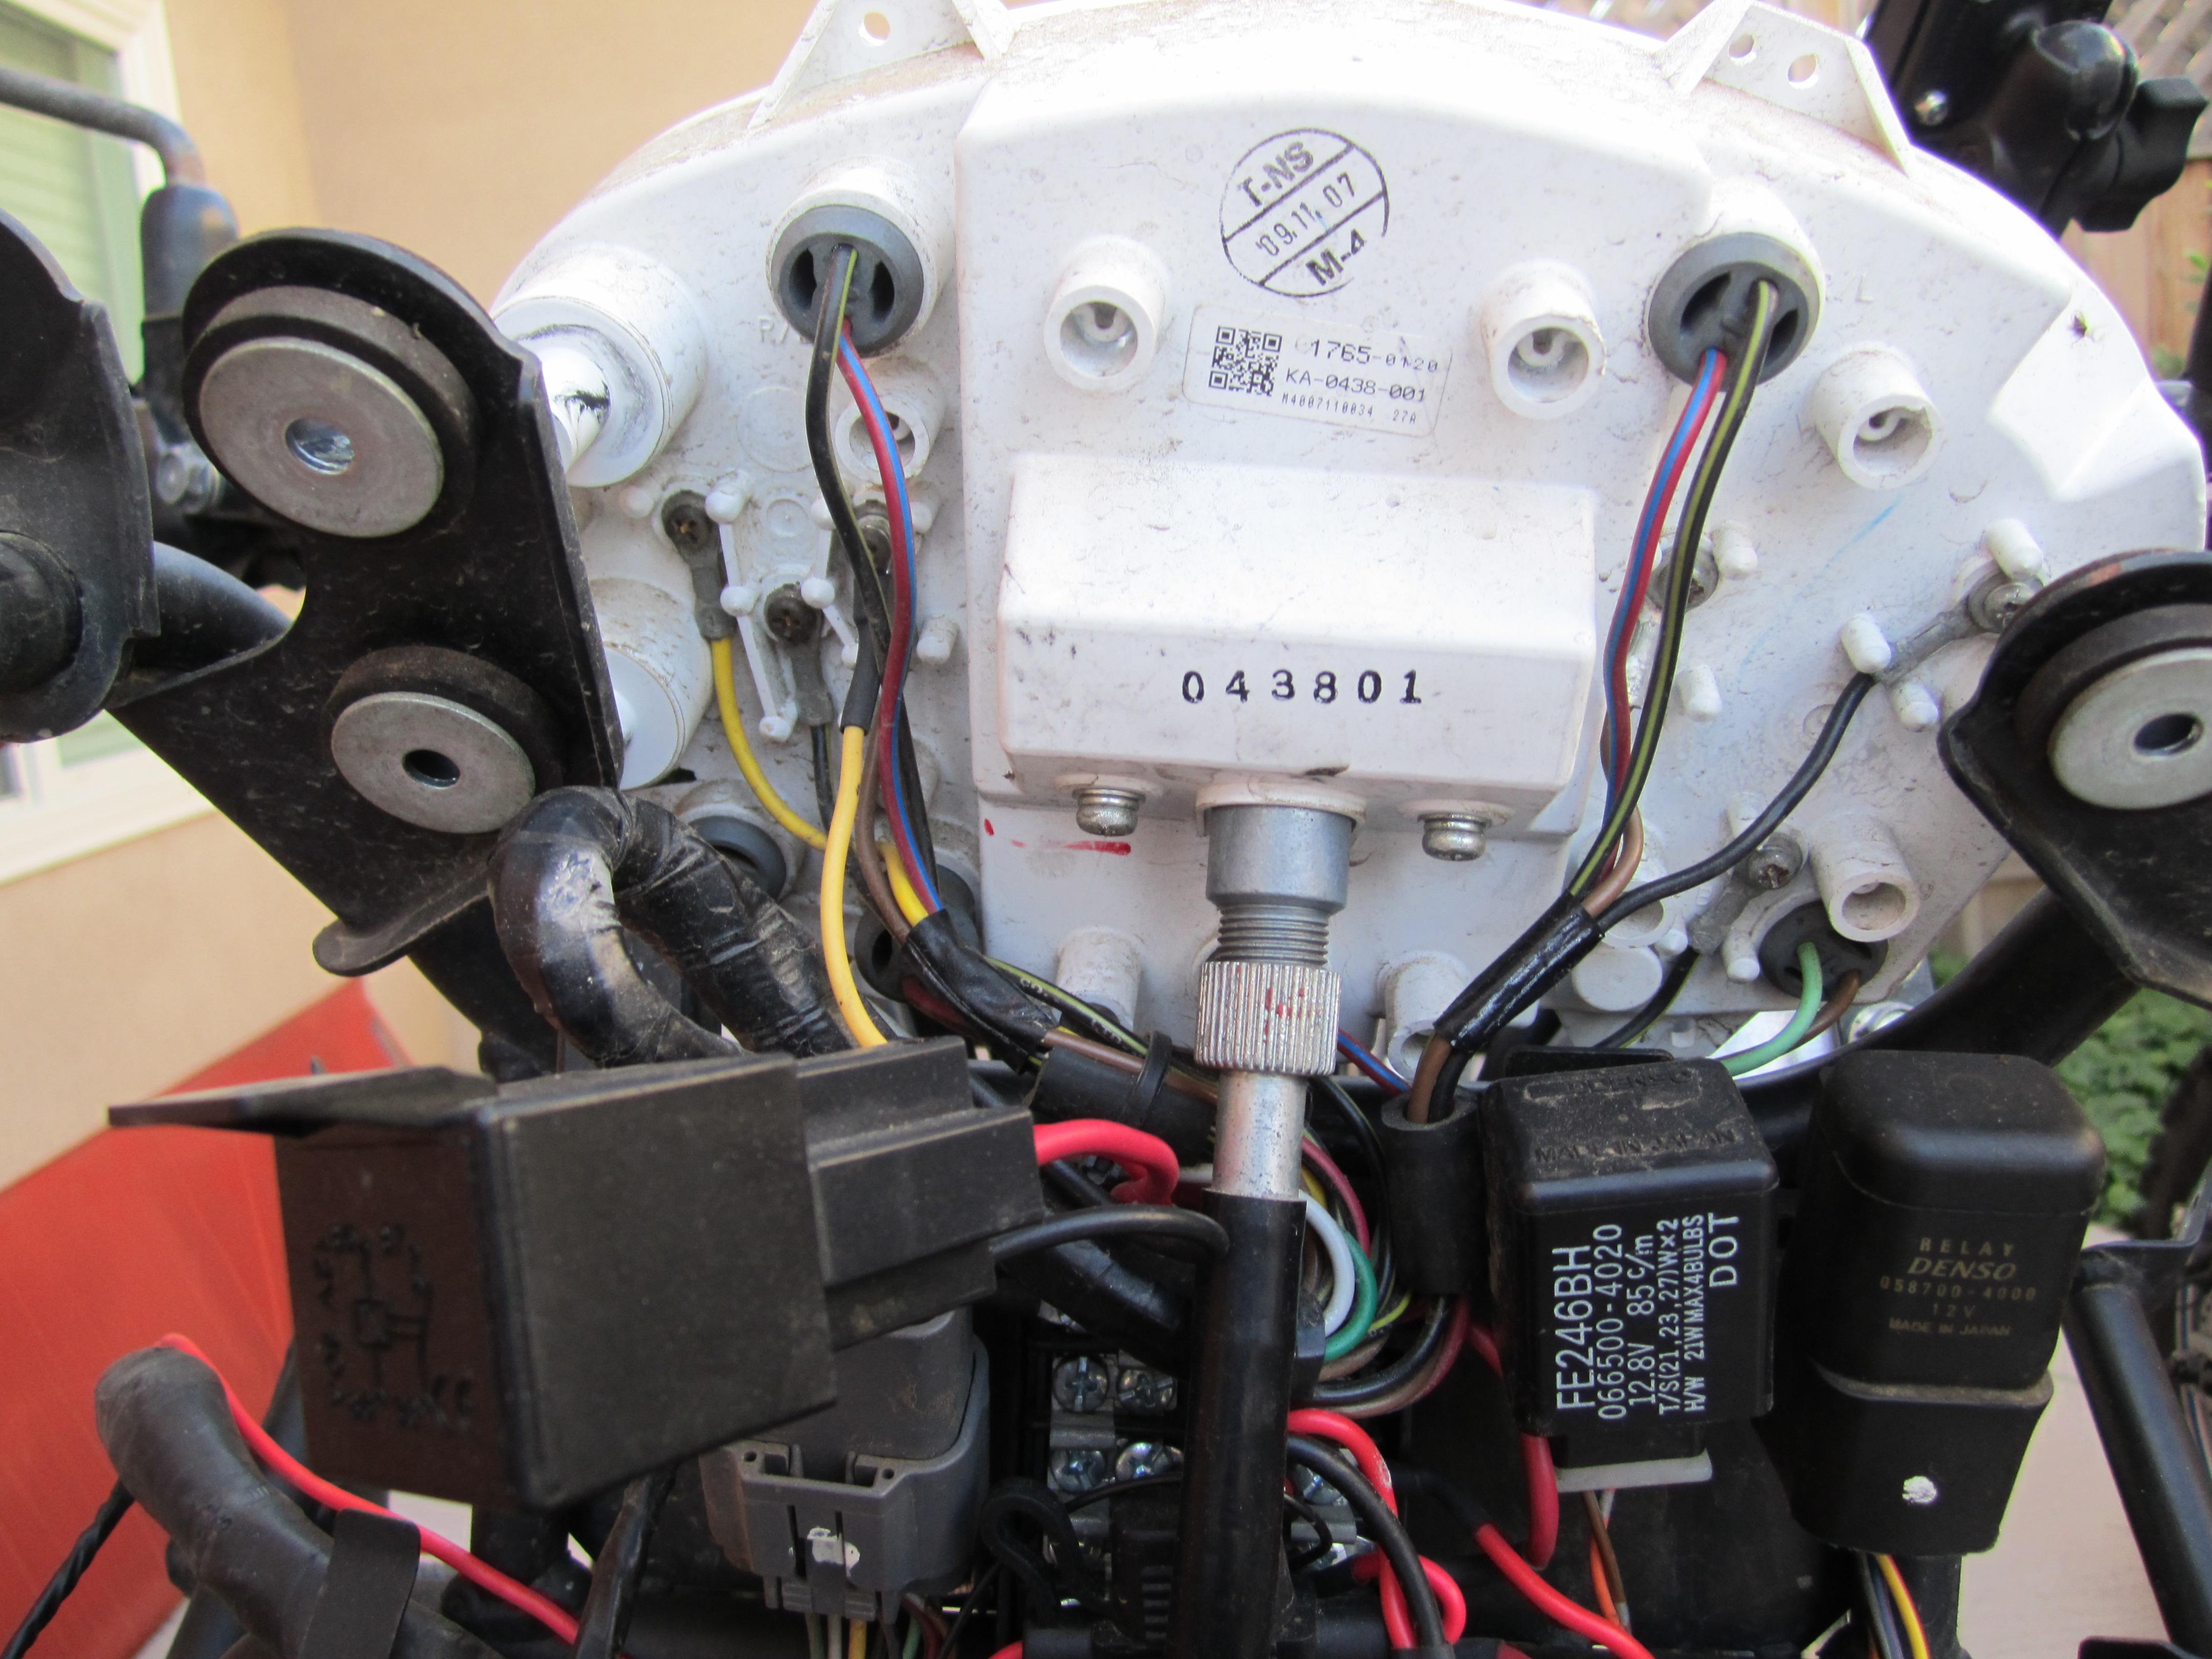 Wiring LED marker lights - Kawasaki KLR 650 Forum